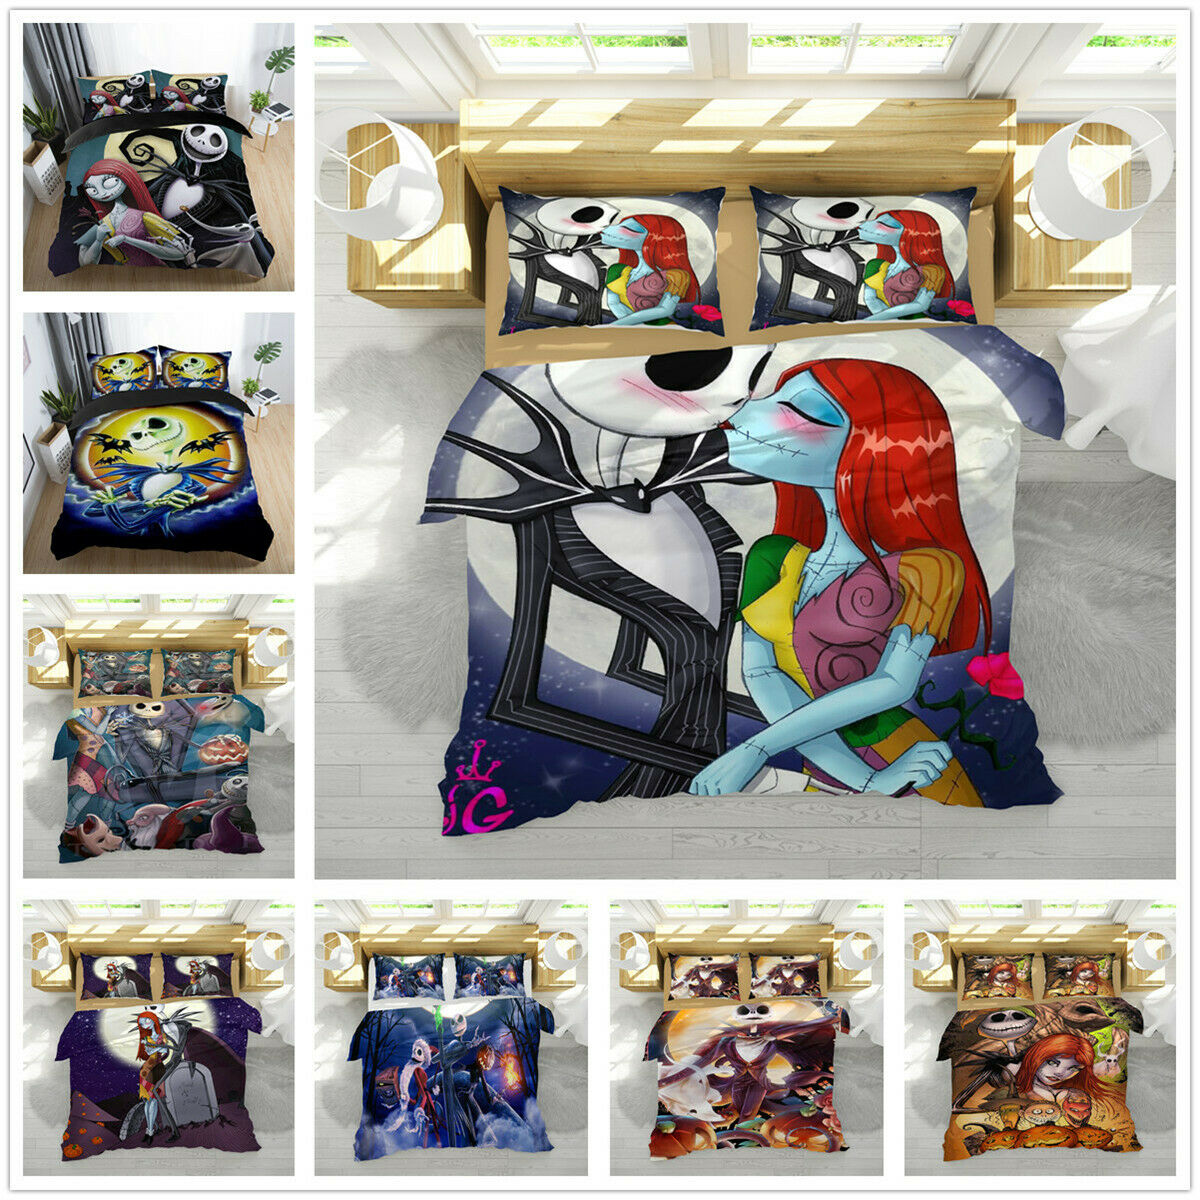 3D The Nightmare Before Christmas Bedding Set Quilt Duvet Doona Cover Pillowcase